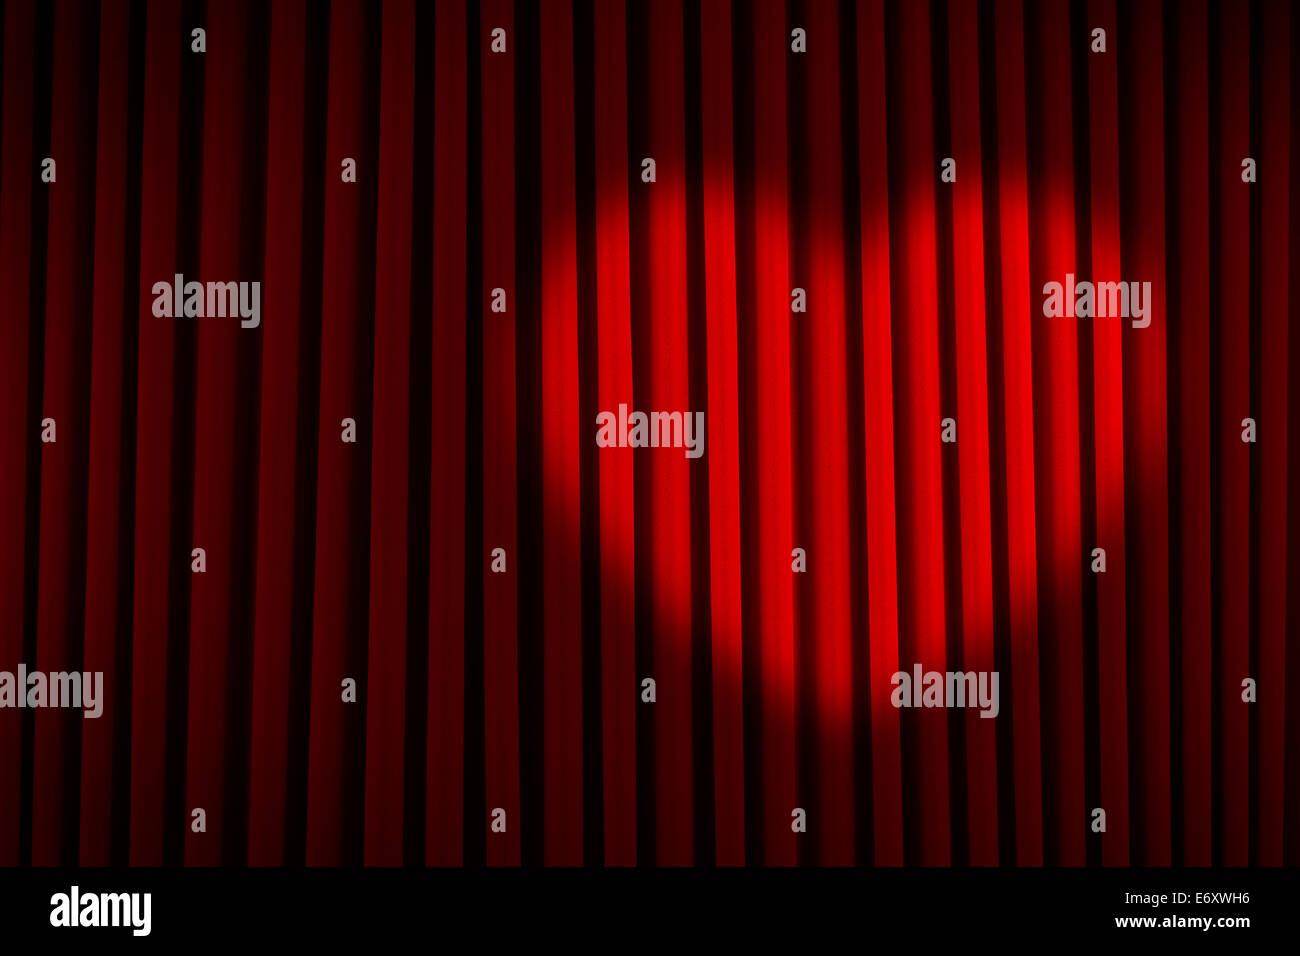 Red curtain spotlight - Red Velvet Stage Curtain With Heart Spotlight